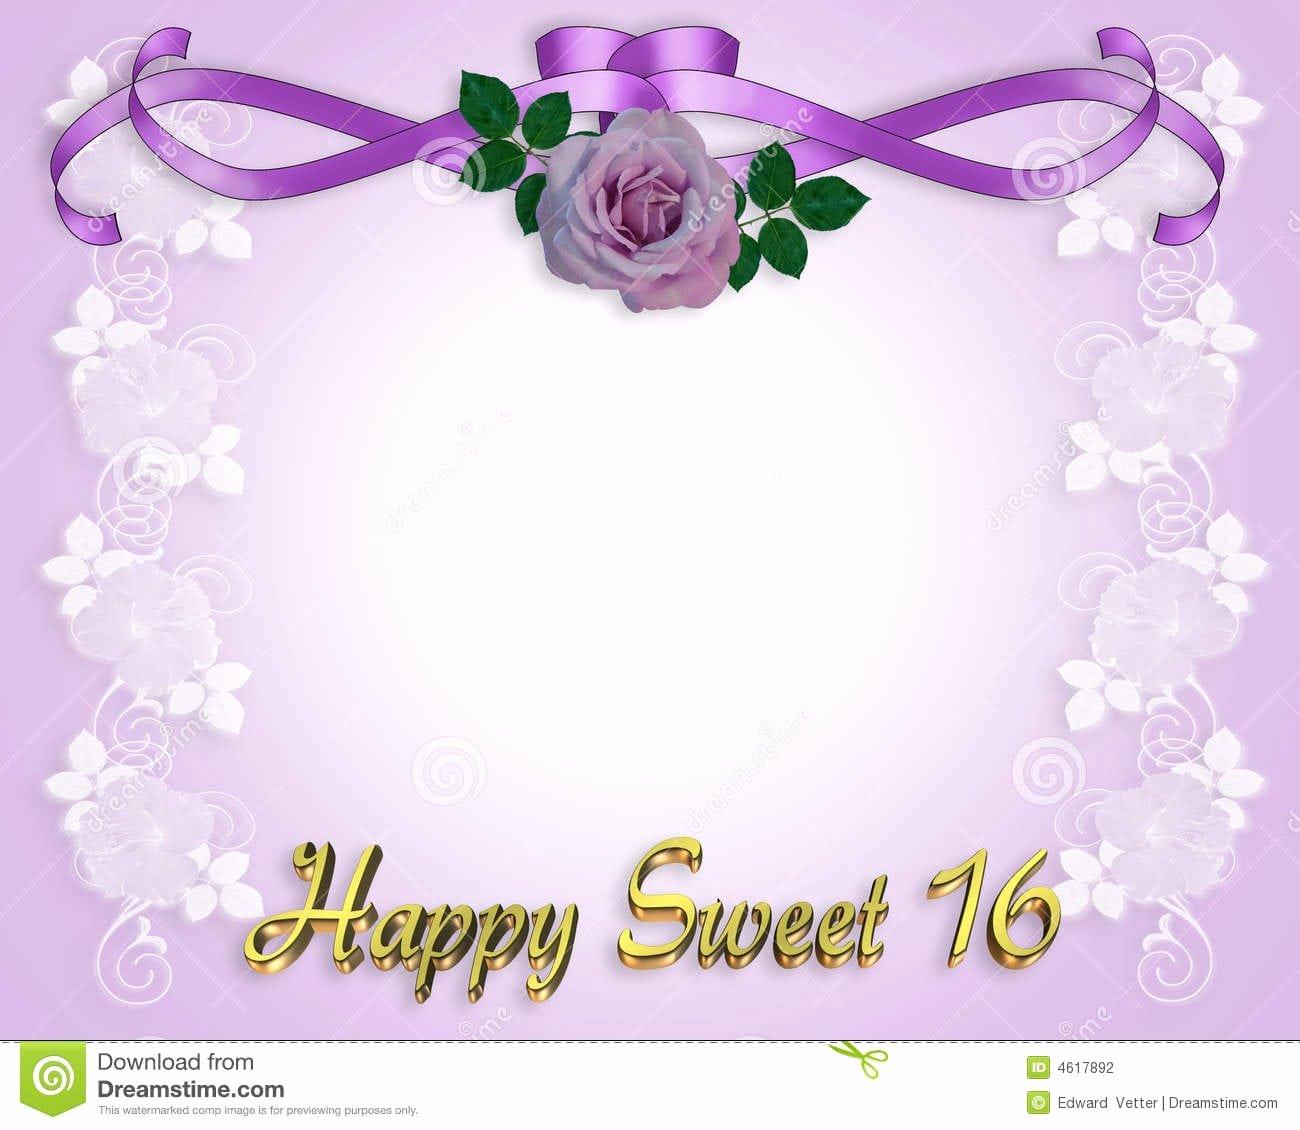 Free Sweet 16 Invitation Template